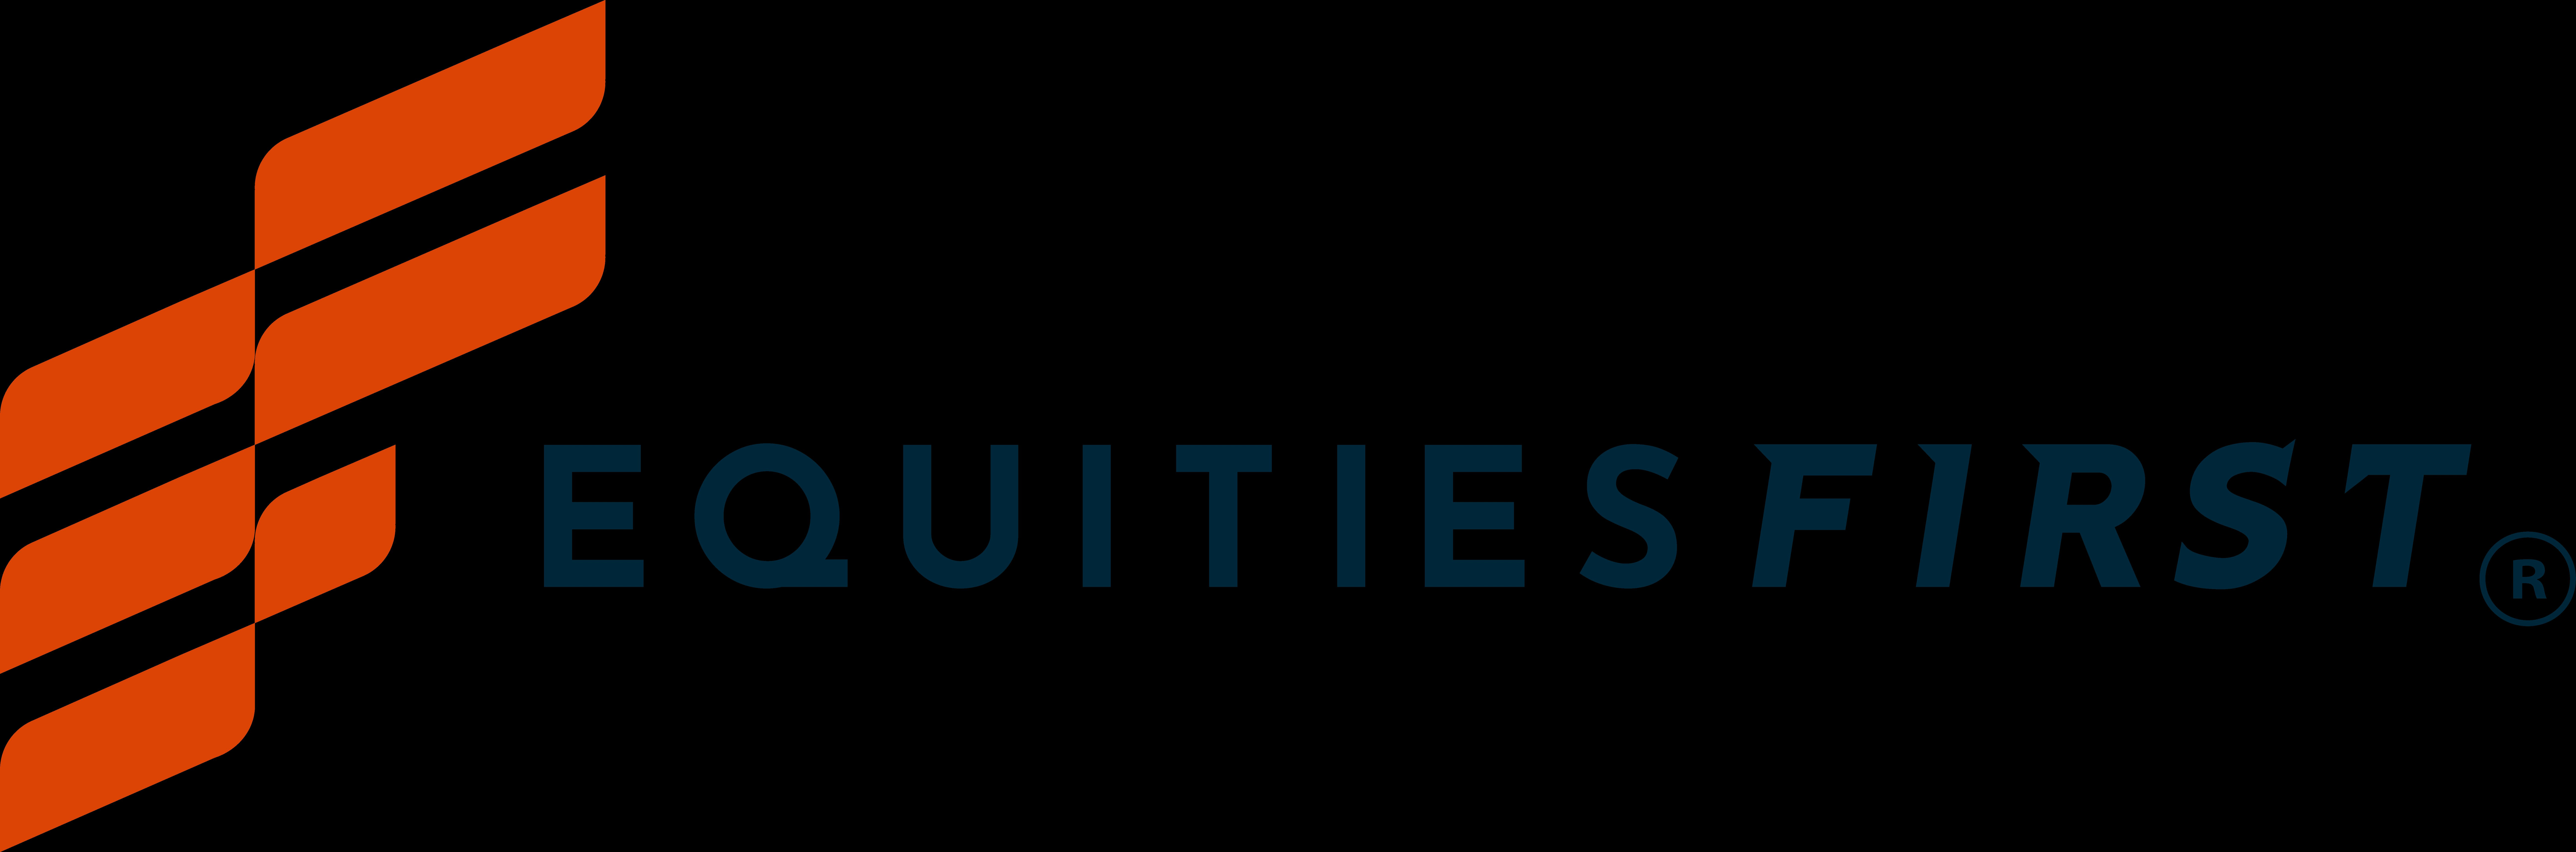 EquitiesFirst